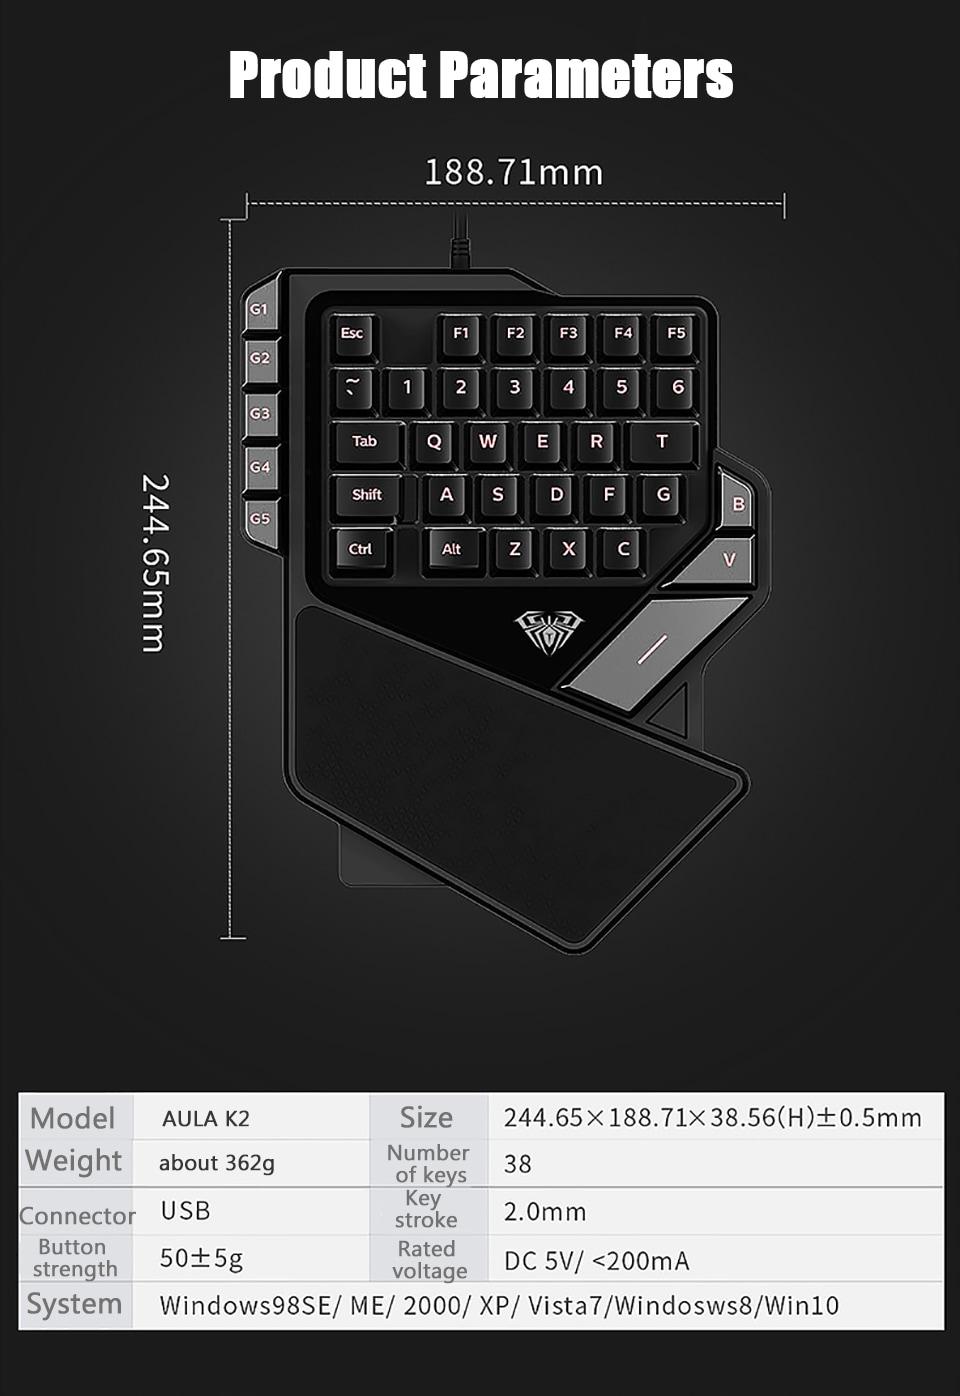 AULA One-Handed Mini Gaming Keyboard Backlight 27 keys Anti-Ghosting - 11